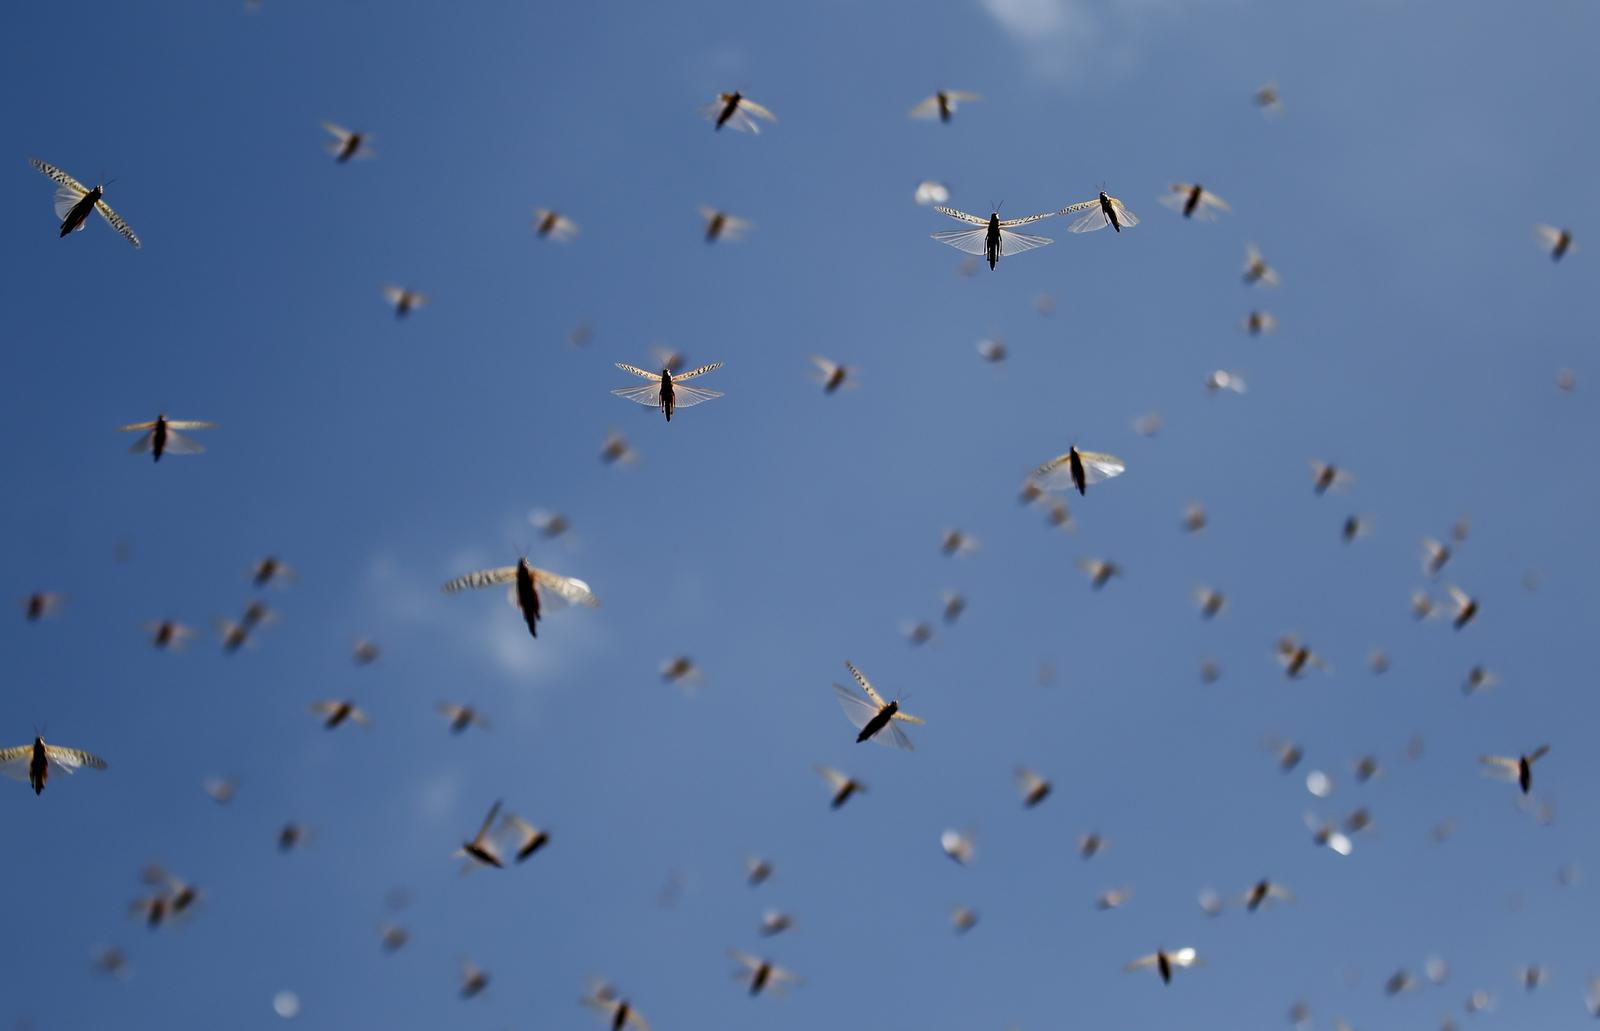 Locusts take flight in the morning in Elburgon, in Nakuru county, Kenya Wednesday, March 17, 2021. AP